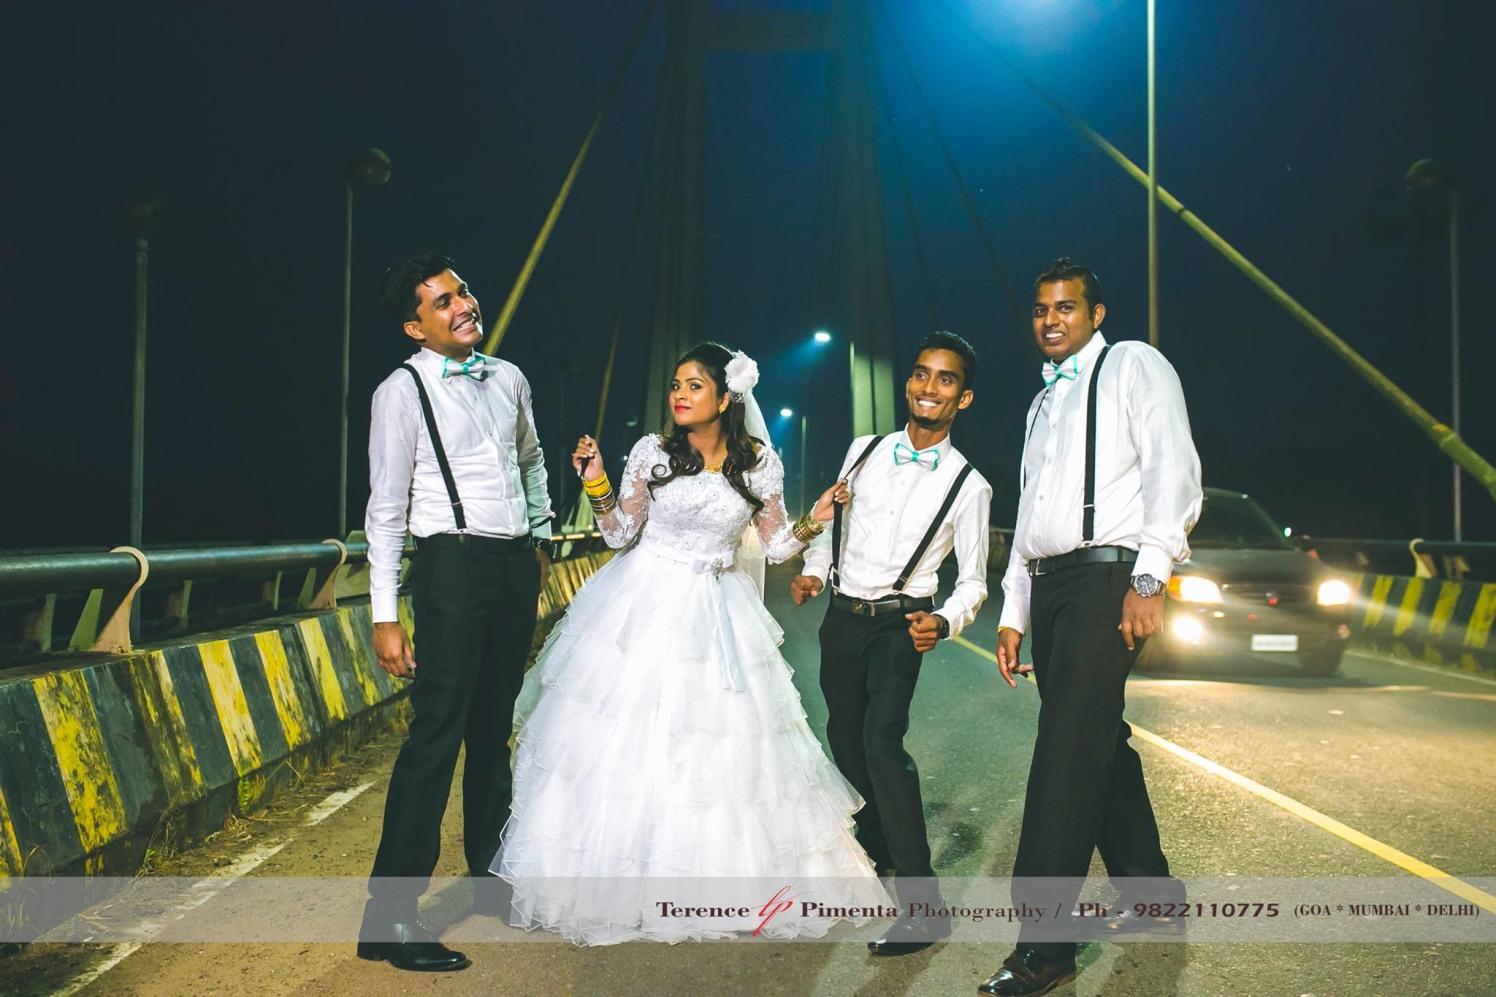 Momento Of Zealotry by Terence Savio Pimenta Wedding-photography | Weddings Photos & Ideas